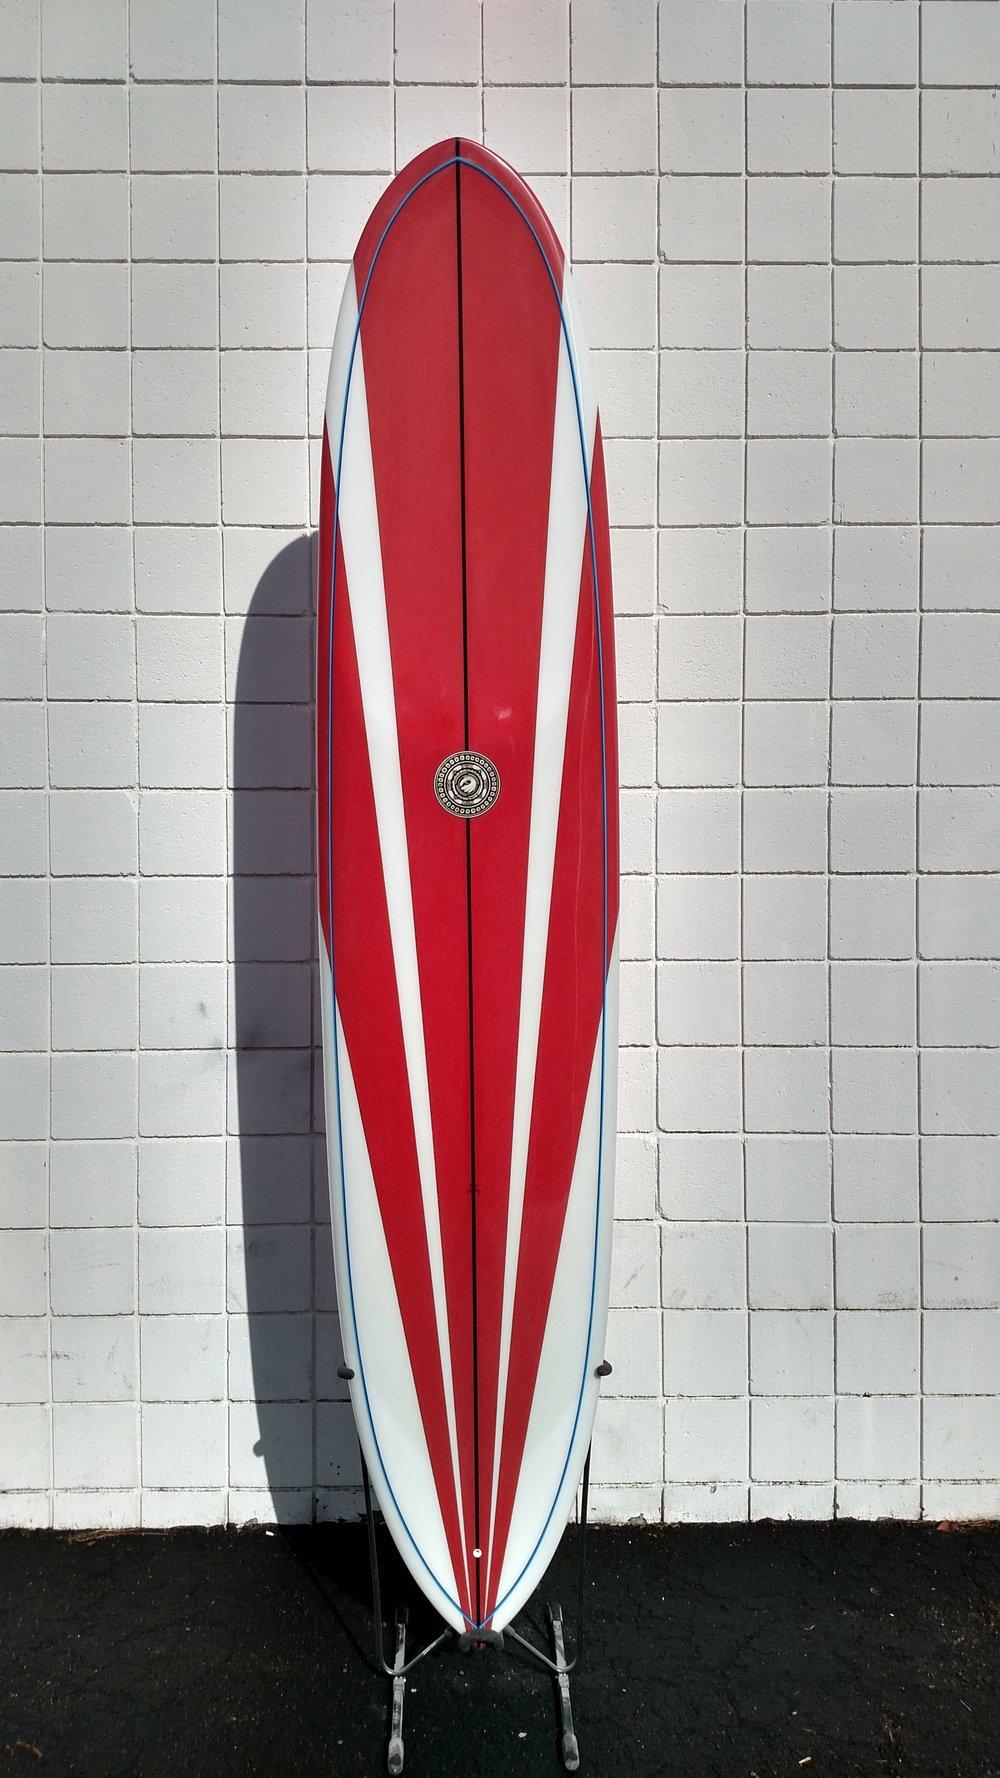 Roger-Hinds-Surfboards_Banzai-Blank.jpg